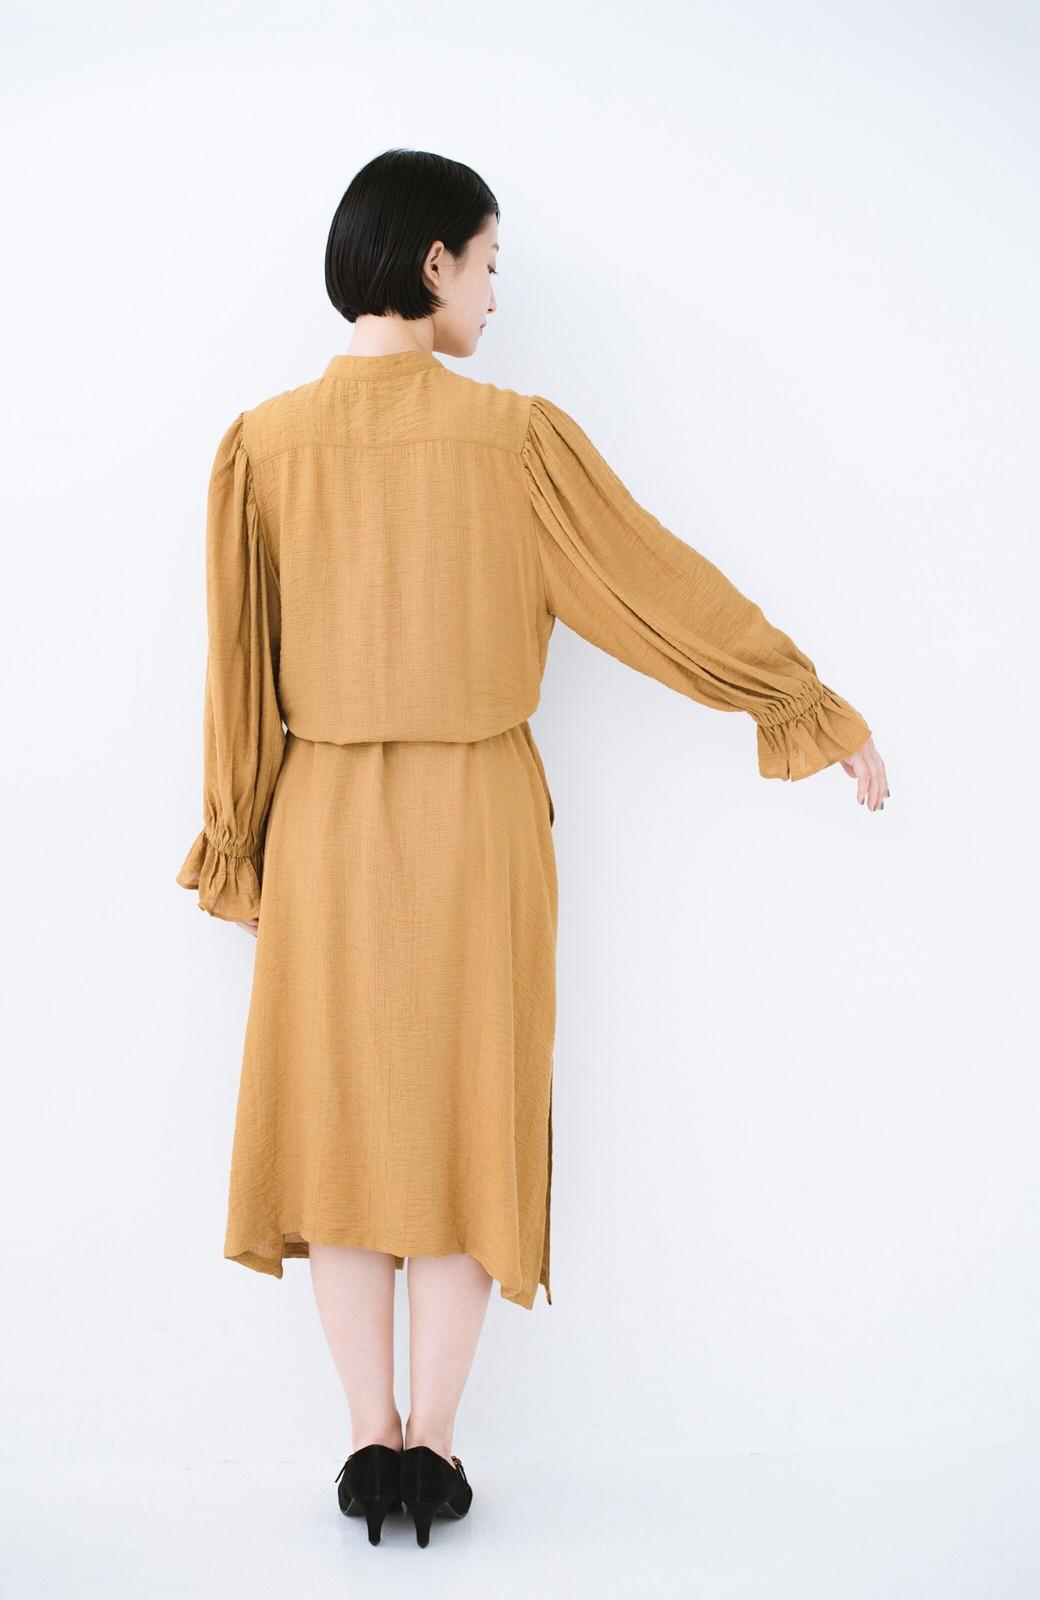 haco! 太ってもばれず 羽織っても便利なウエストリボンワンピース <マスタード>の商品写真18